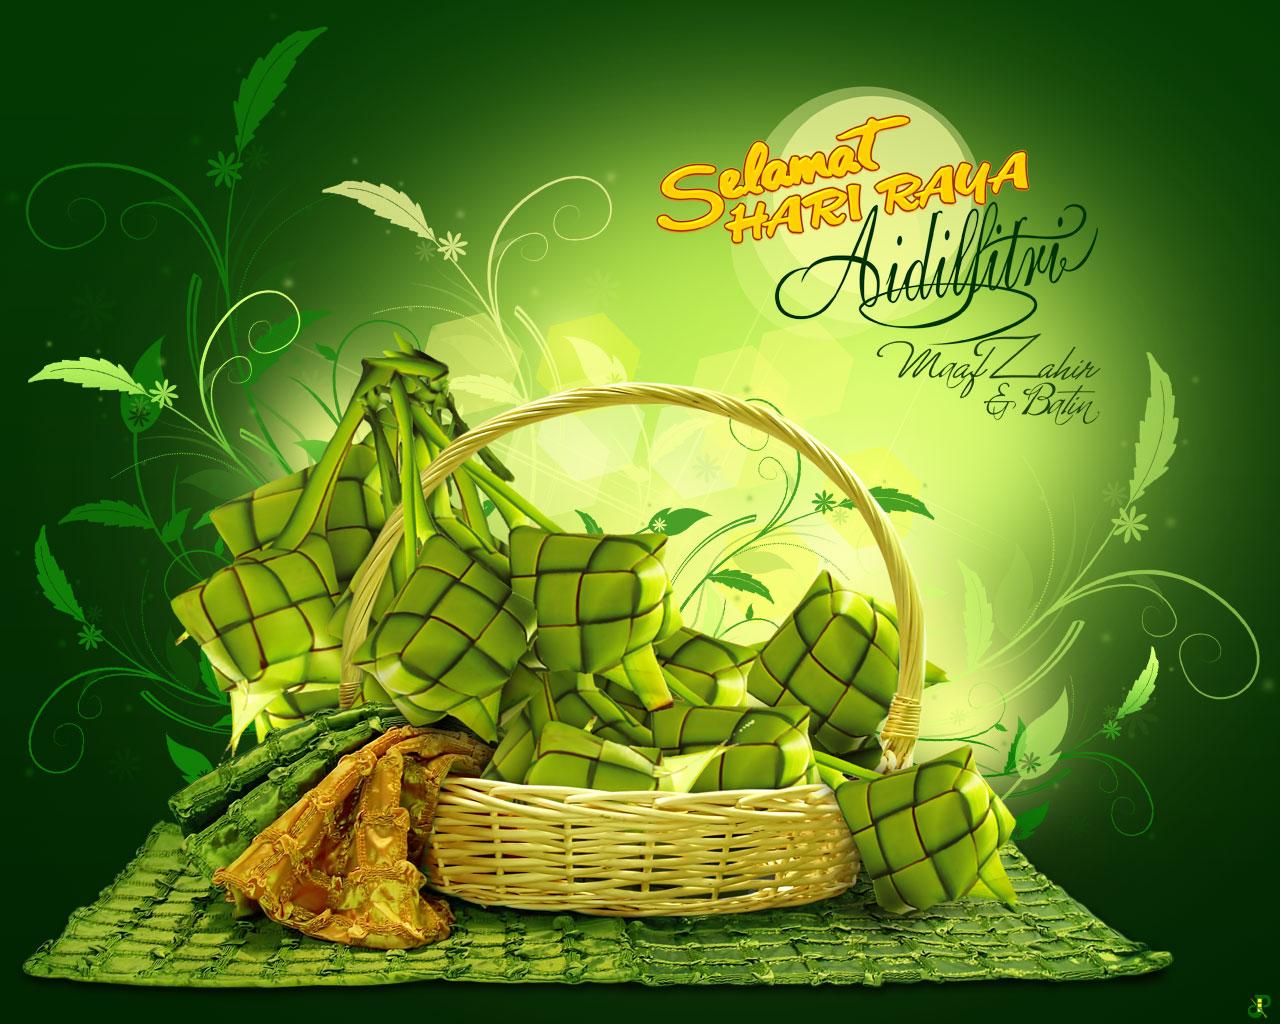 http://1.bp.blogspot.com/-sWRcUm2GLOI/UBJCWjQVzKI/AAAAAAAAANw/KS2wDeh5H9Q/s1600/Wallpaper+Lebaran+2012+%2820%29.jpg